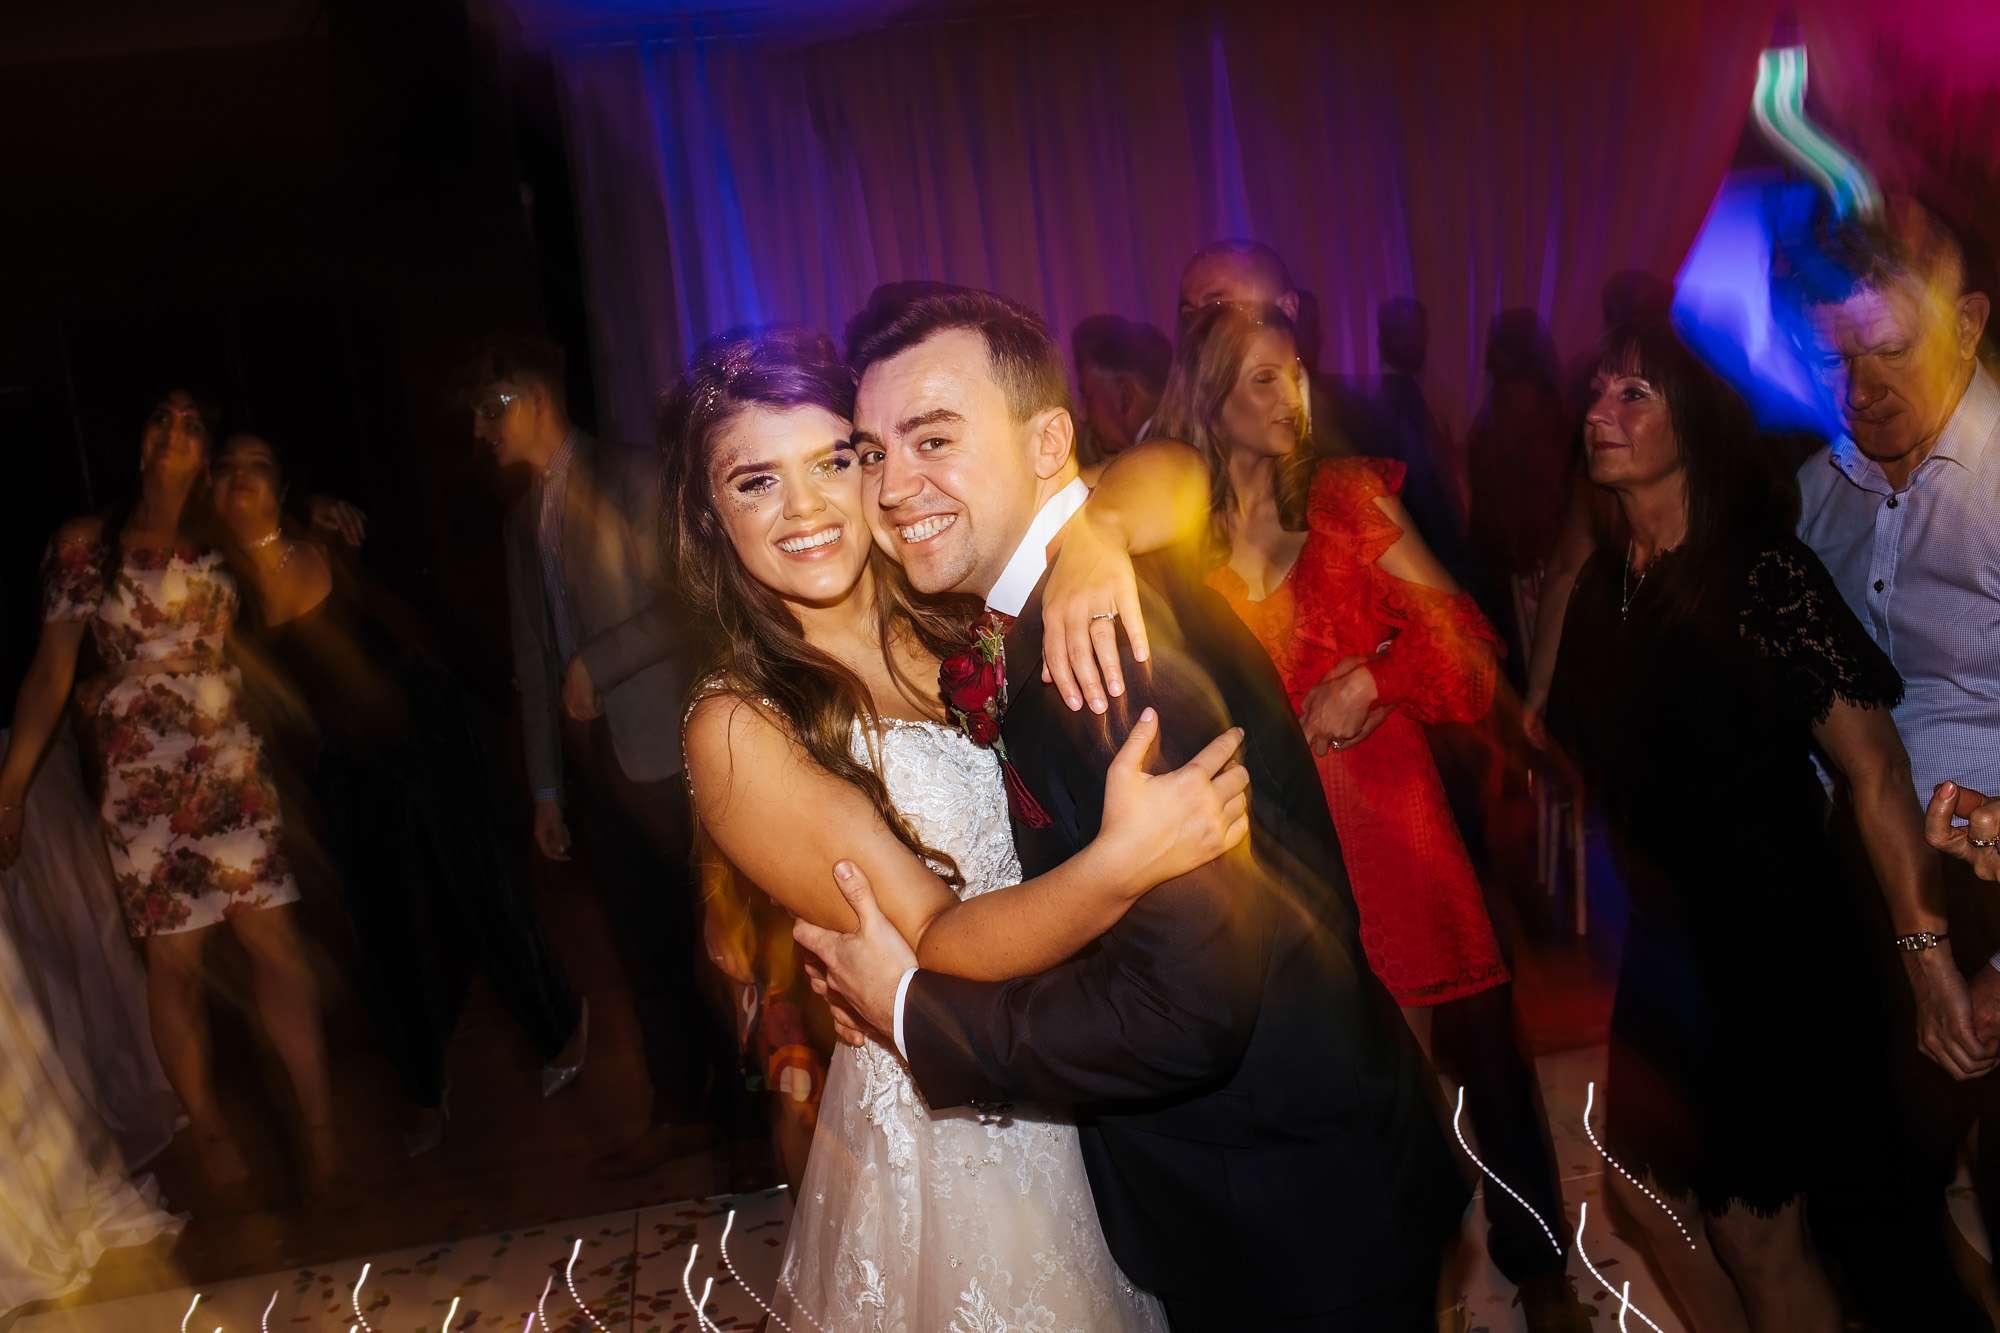 Bride and groom dancing at their wedding in Blackpool